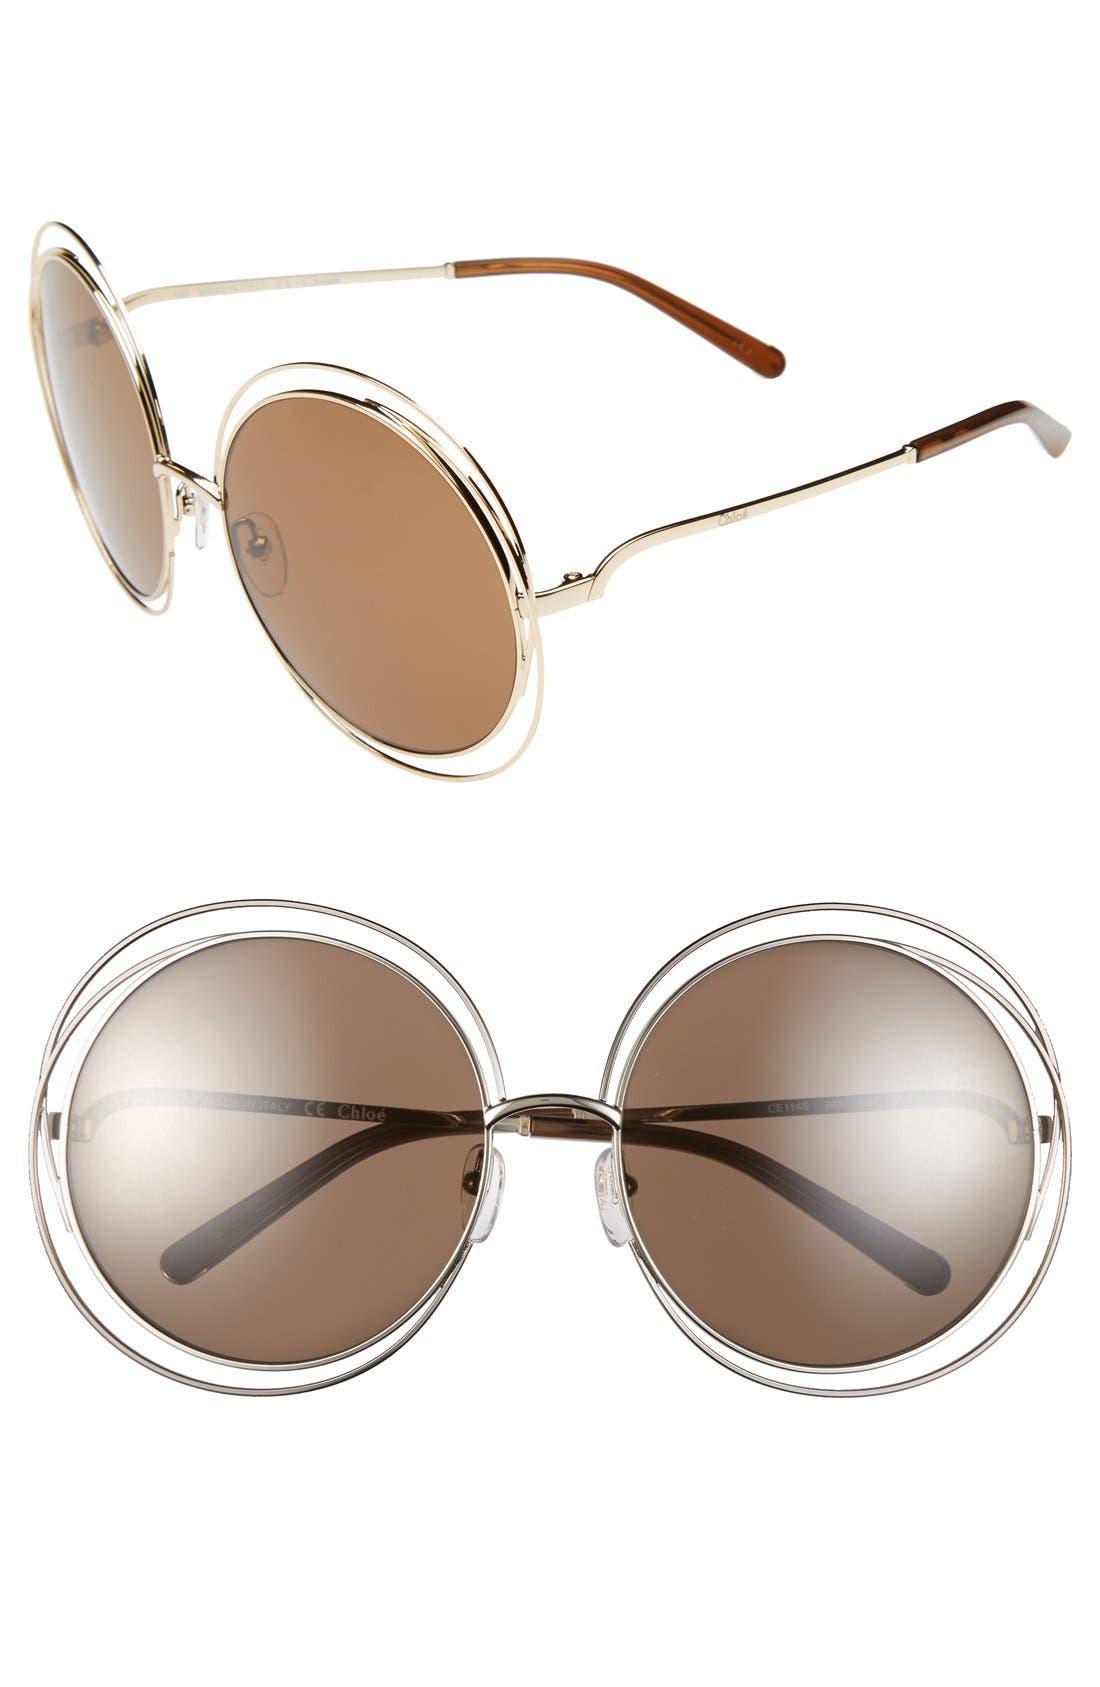 62mm Oversize Sunglasses,                         Main,                         color, Gold/ Transparent Brown